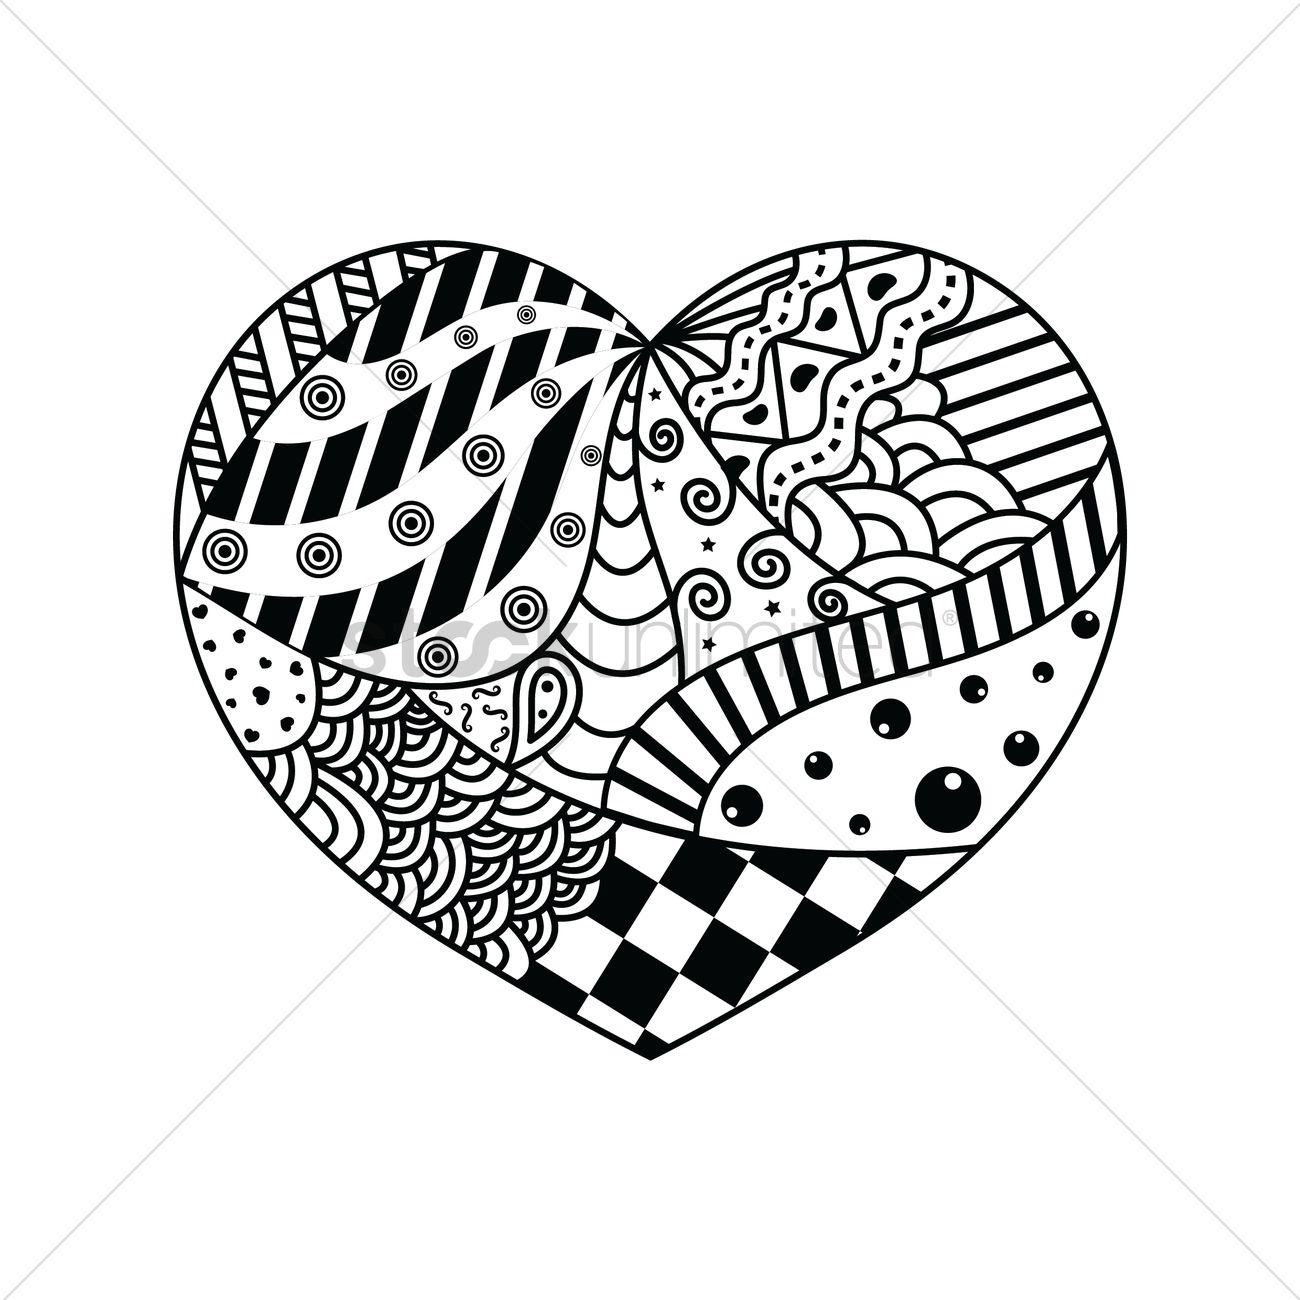 1300x1300 Decorative Heart Design Vector Image